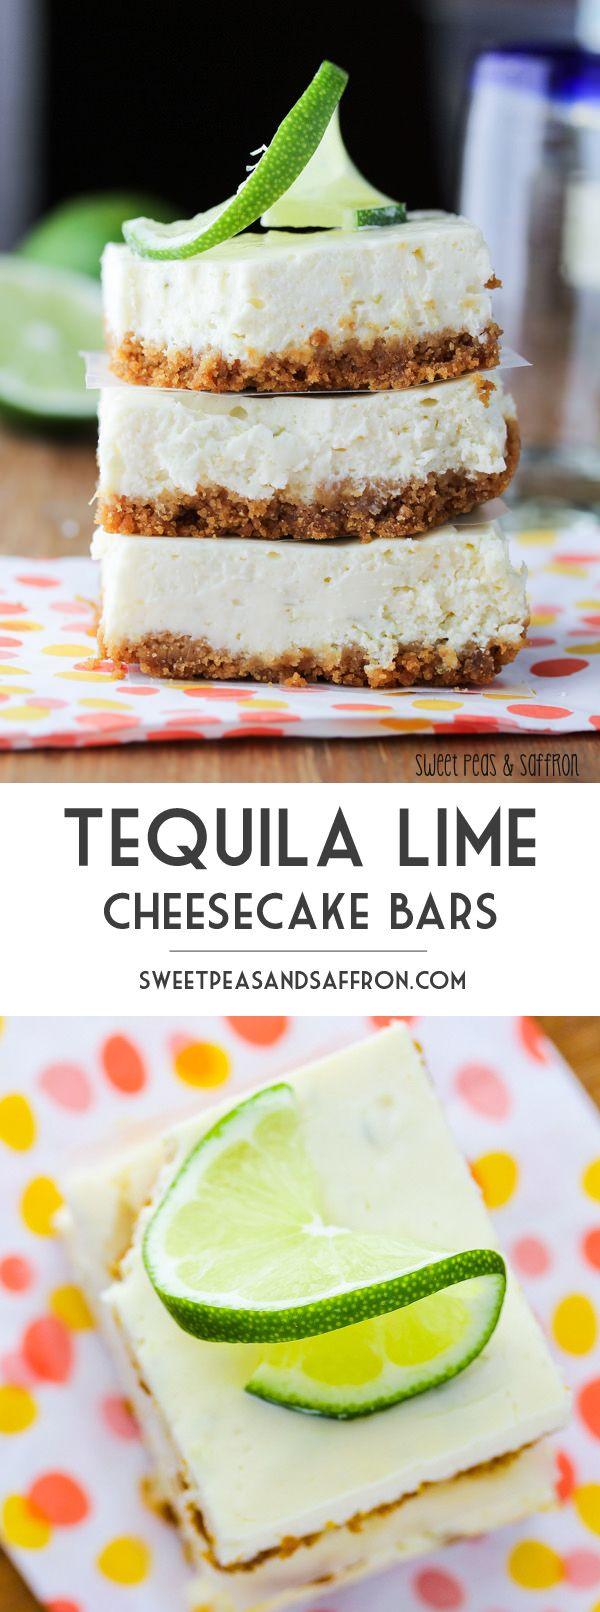 Tequila Lime Cheesecake Bars | sweetpeasandsaffron.com @sweetpeasaffron